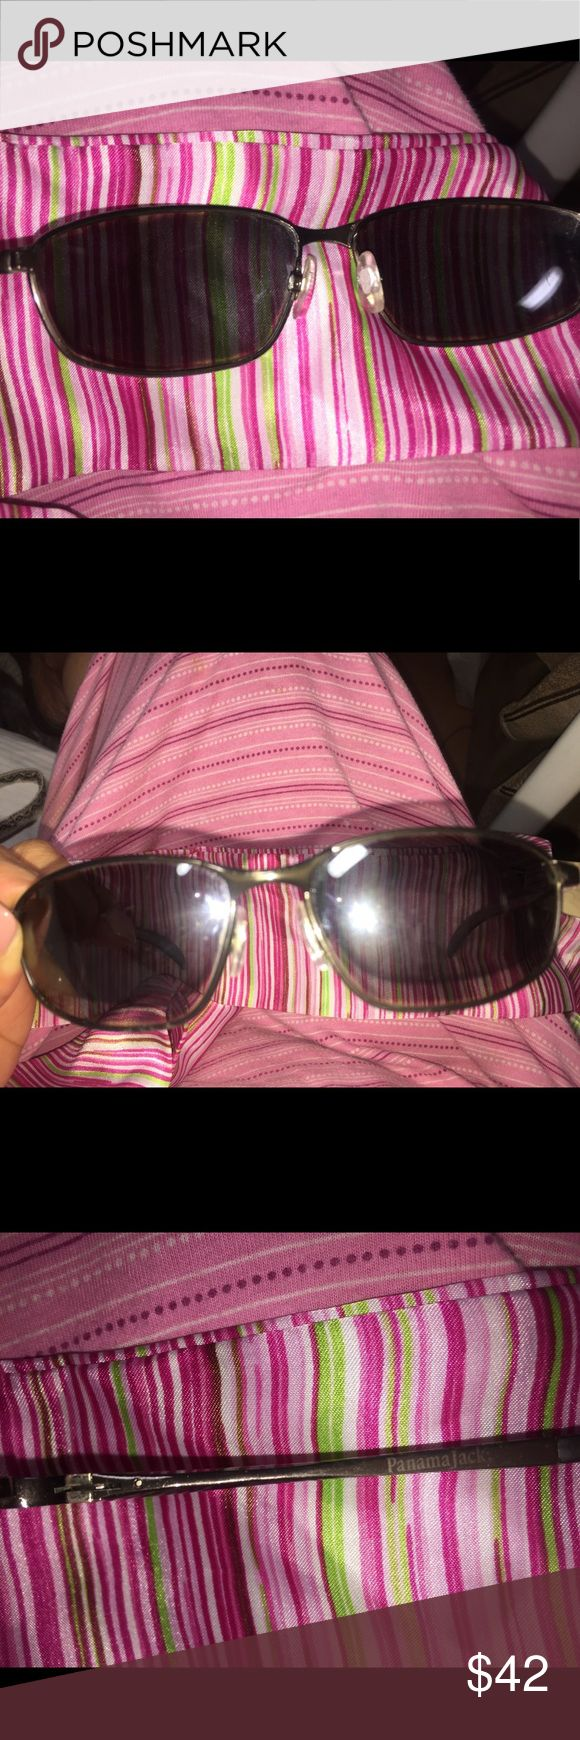 Panama Jack sunglasses unisex style Panama jack sunglasses amber tiny small scratch  in good condition Panama Jack Accessories Sunglasses